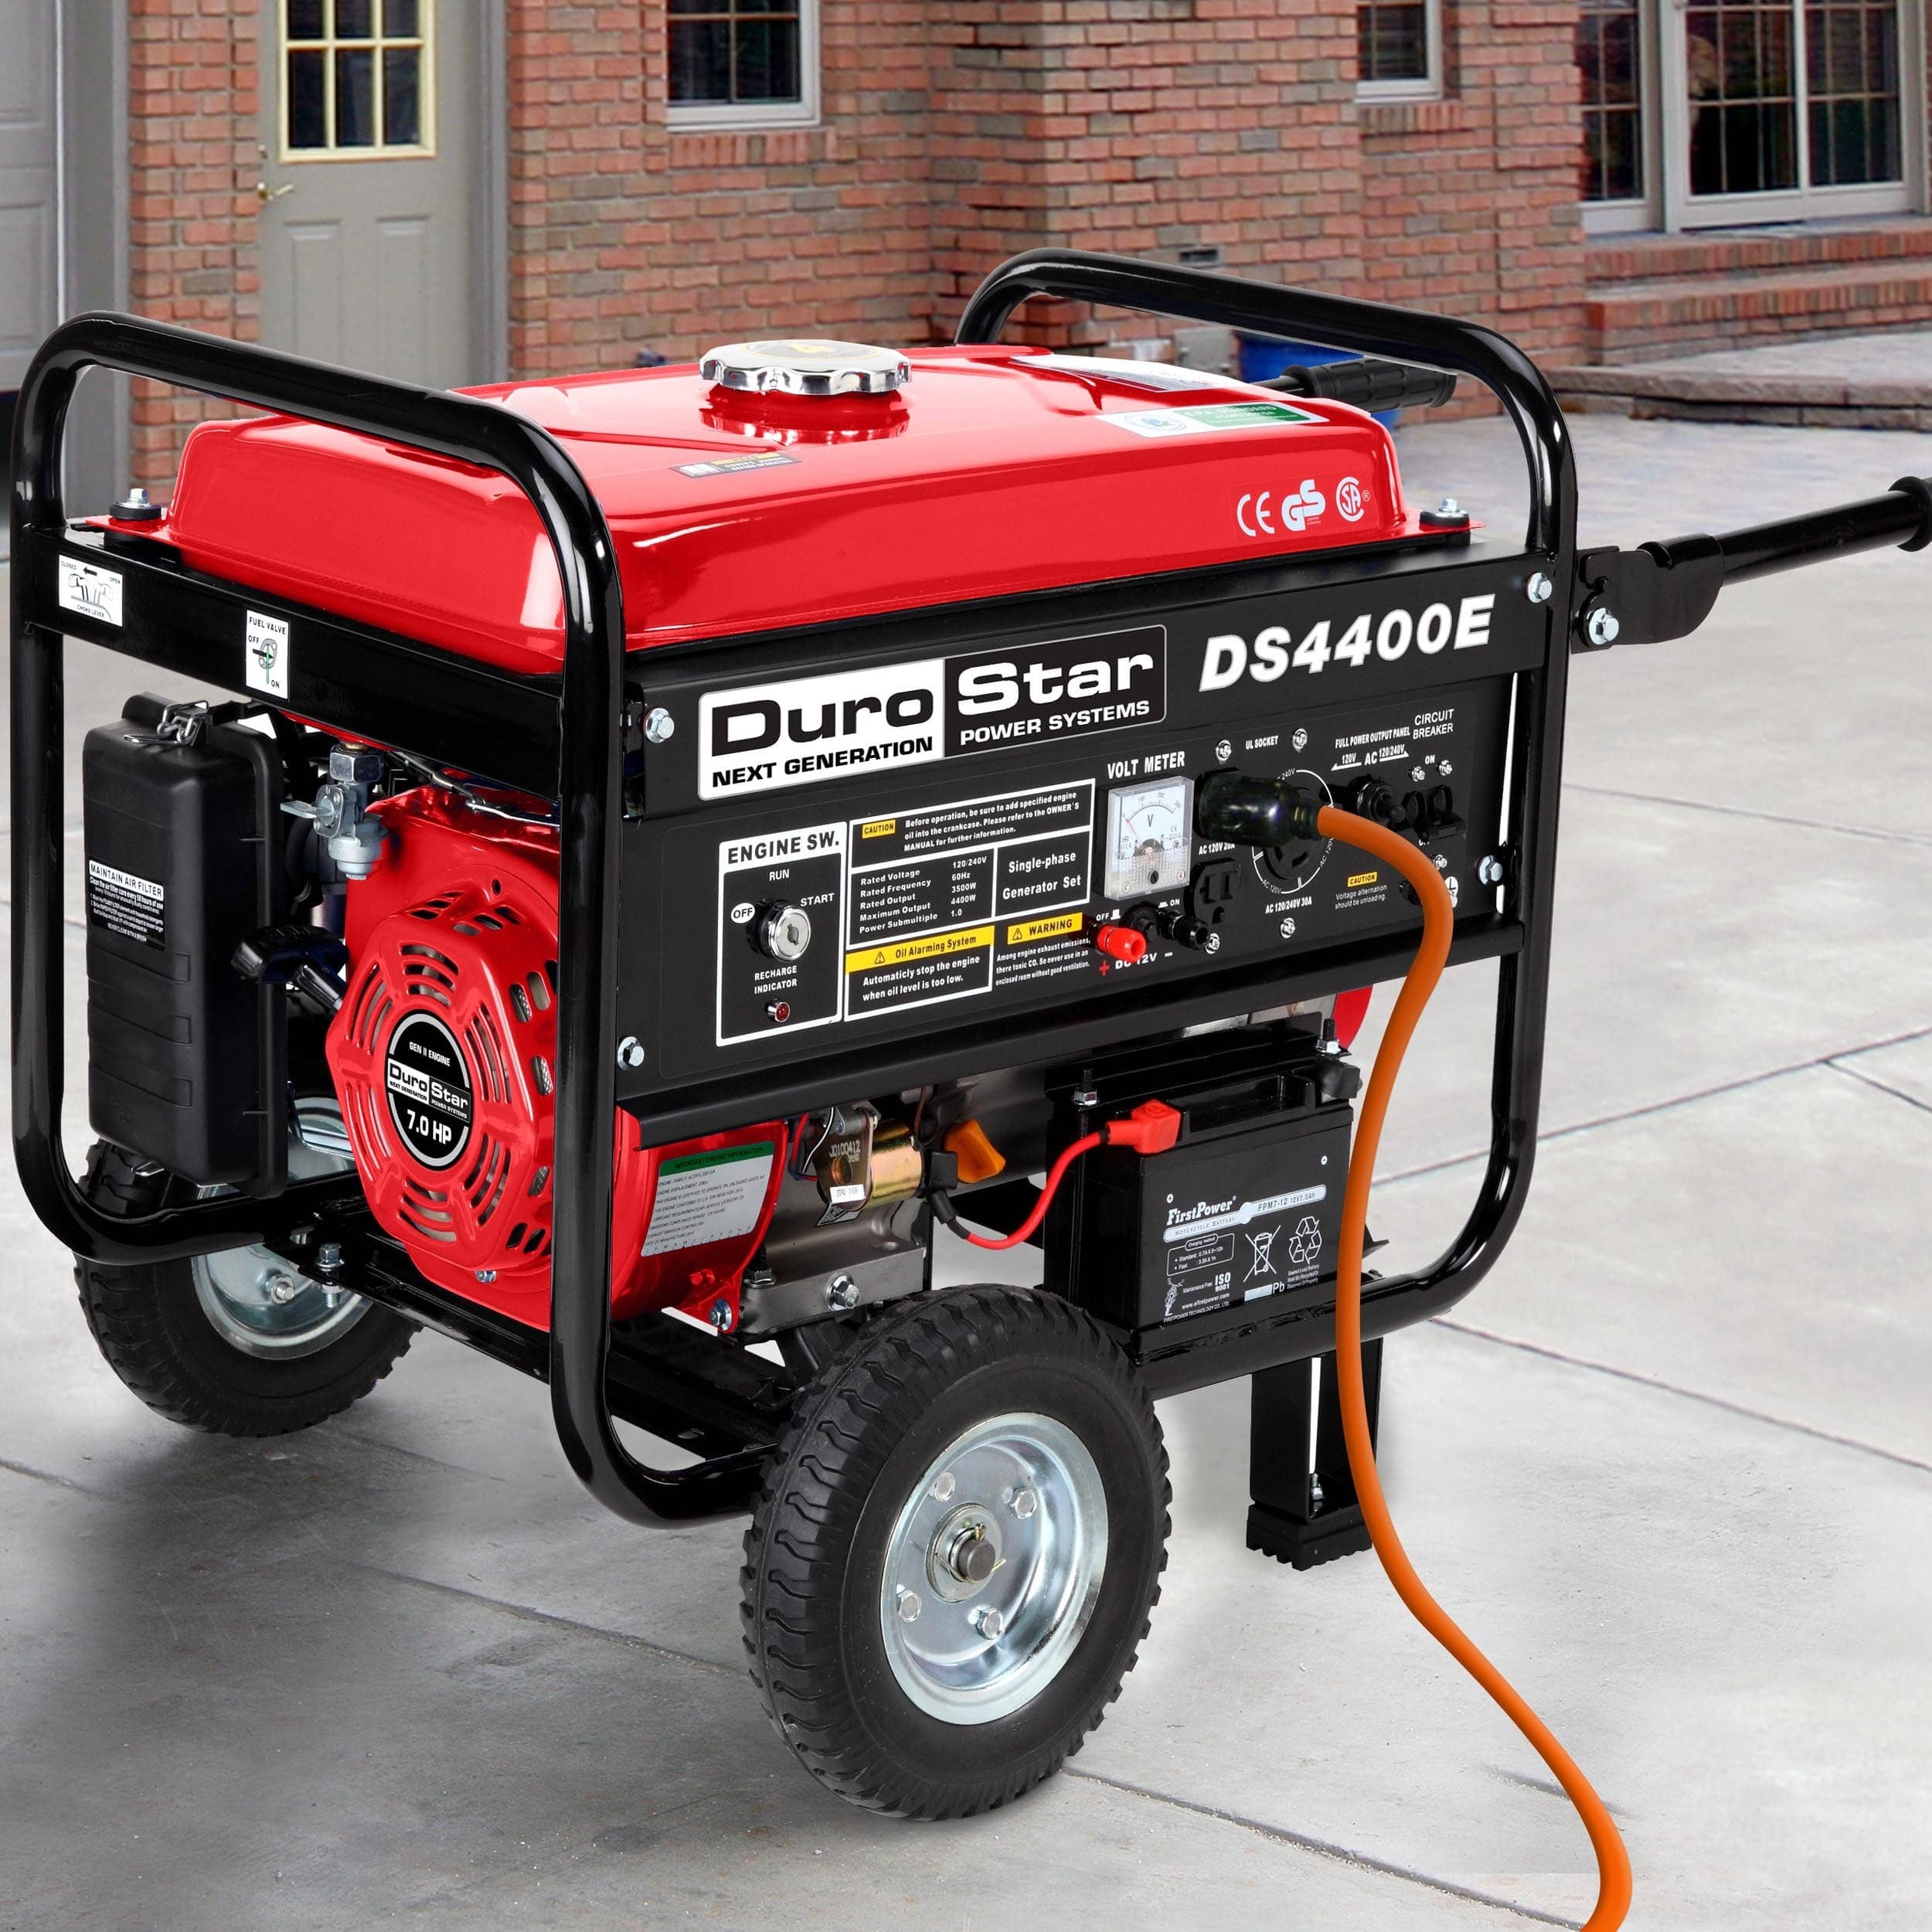 DuroStar 4400 Watt 7.0 HP Air Cooled OHV Gas Generator w/...